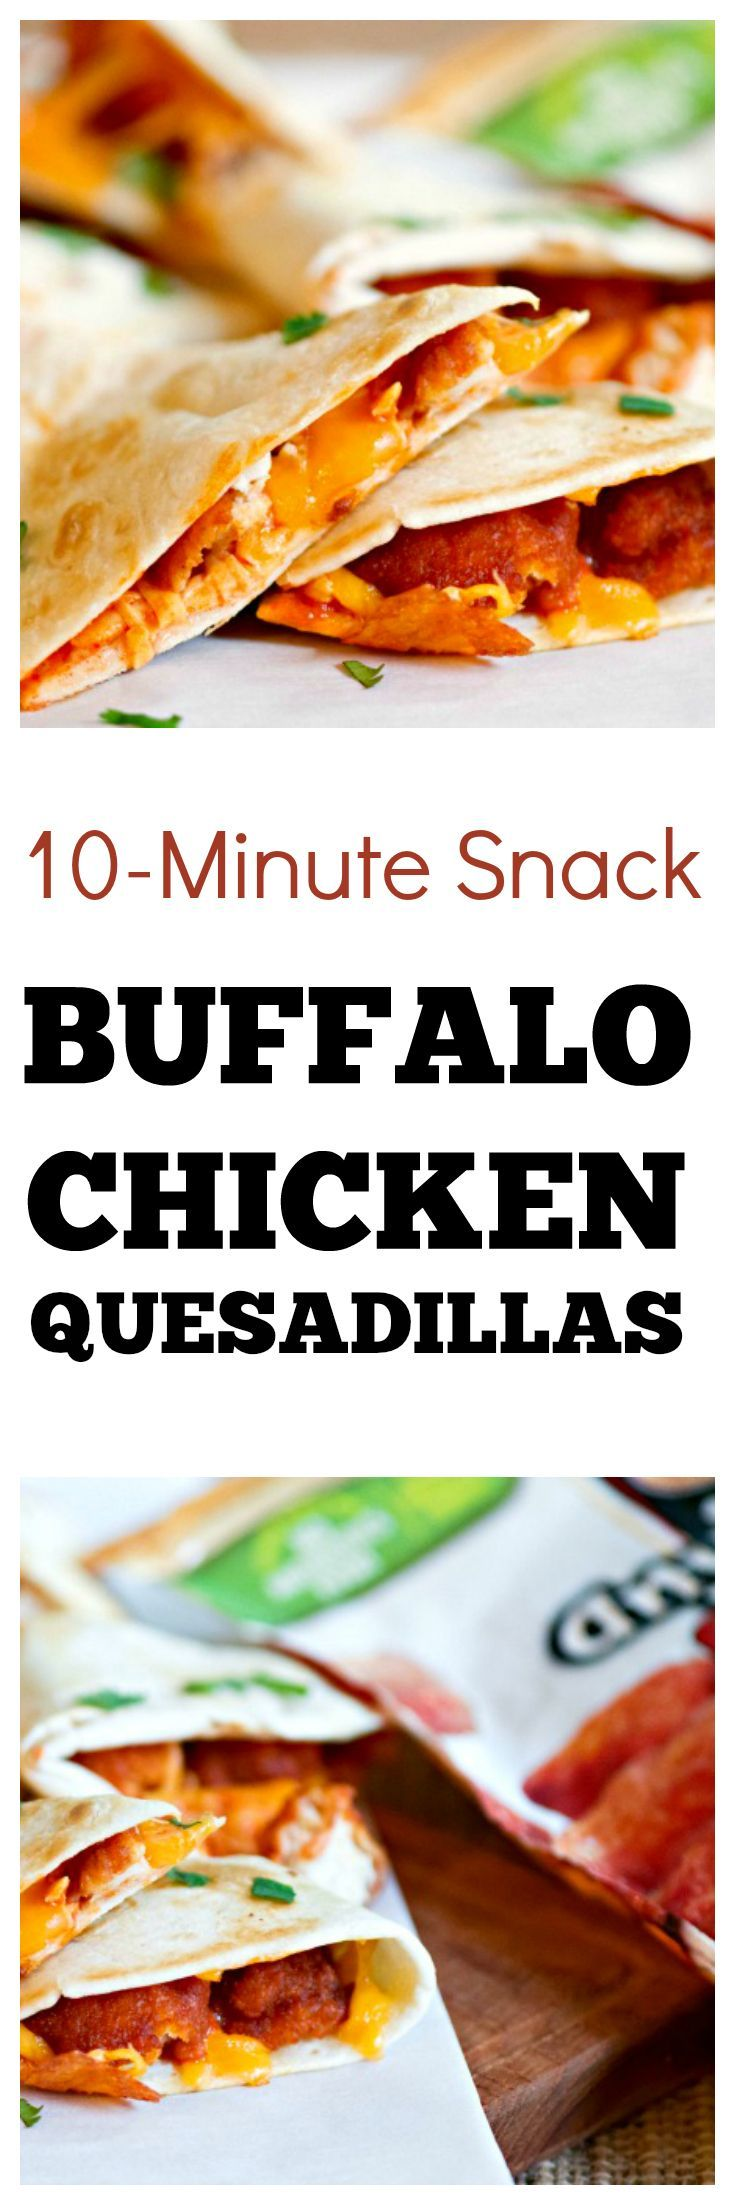 Buffalo Chicken Quesadilla Recipe | Easy snack recipe #ad #snackideas #cheesy